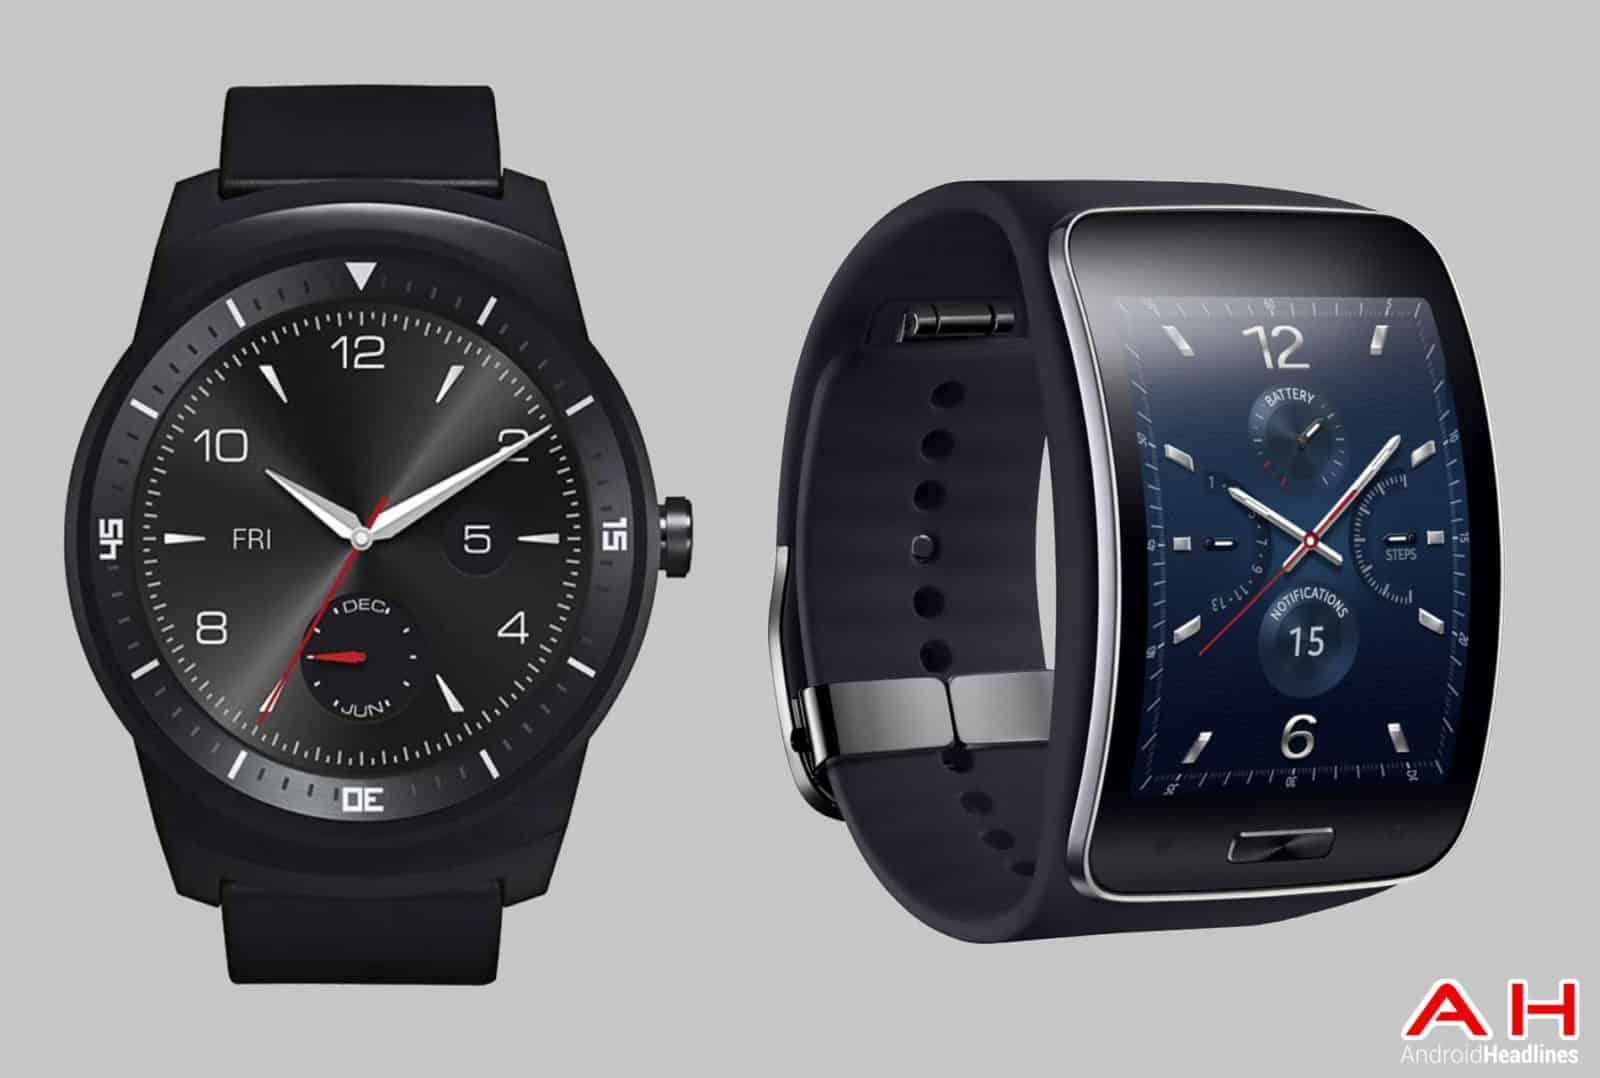 LG G Watch R vs Gear S cam AH